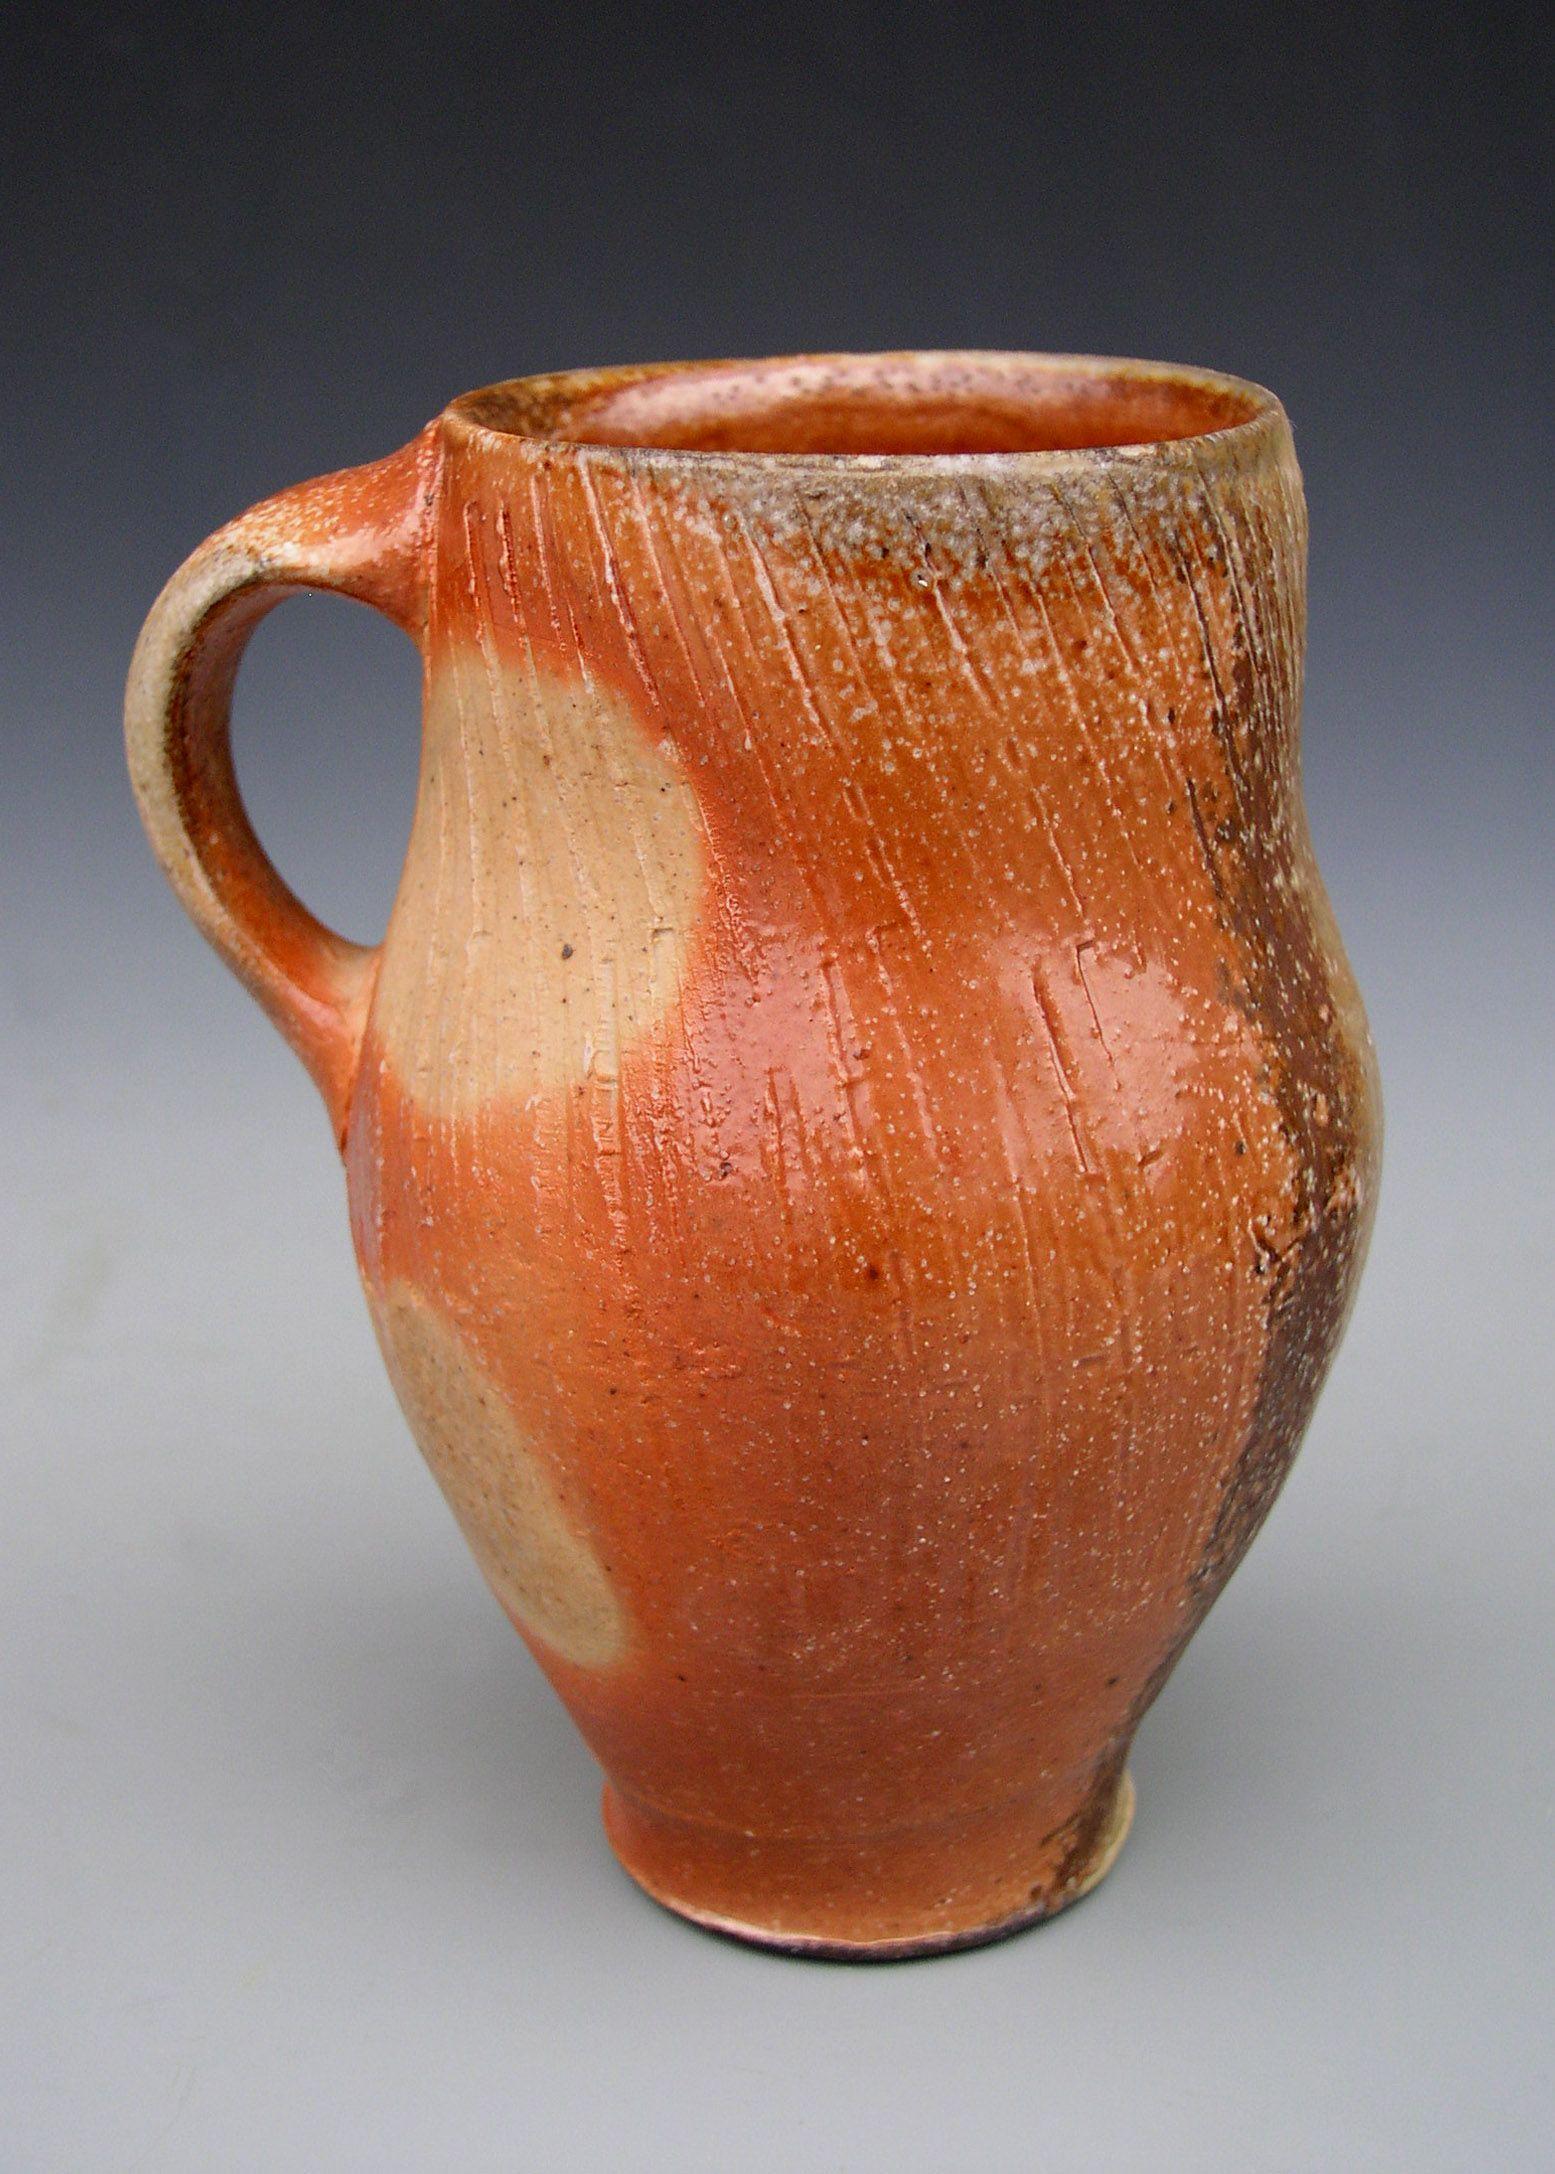 Simon Levin Pottery cups, Ceramic mugs, Ceramic cups